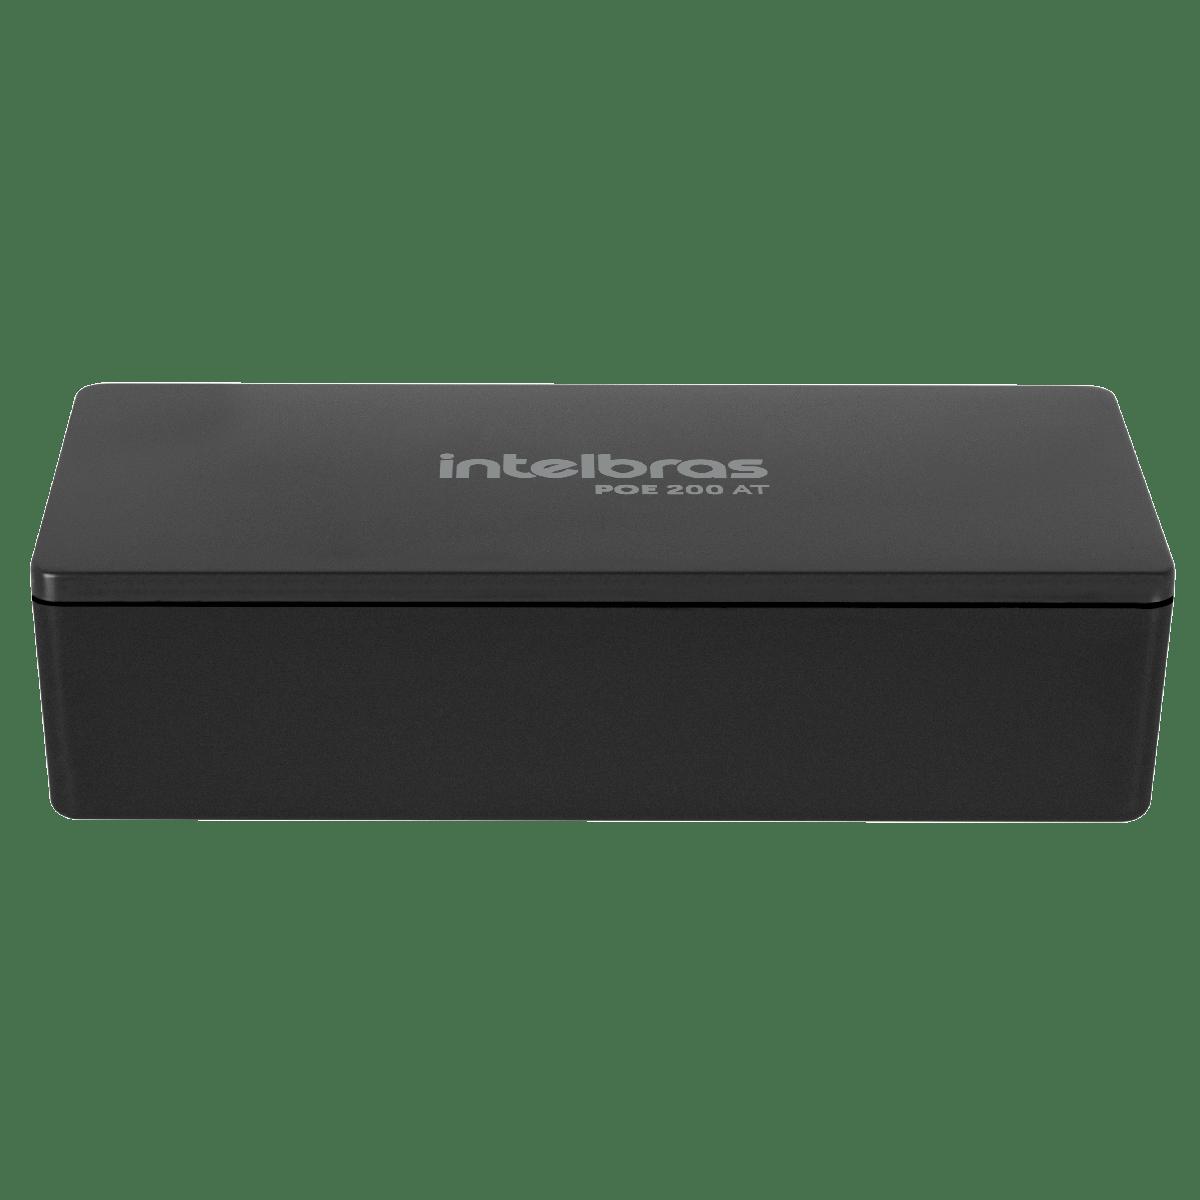 Injetor Conversor Intelbras PoE Ativo Gigabit Ethernet - PoE 200 AT